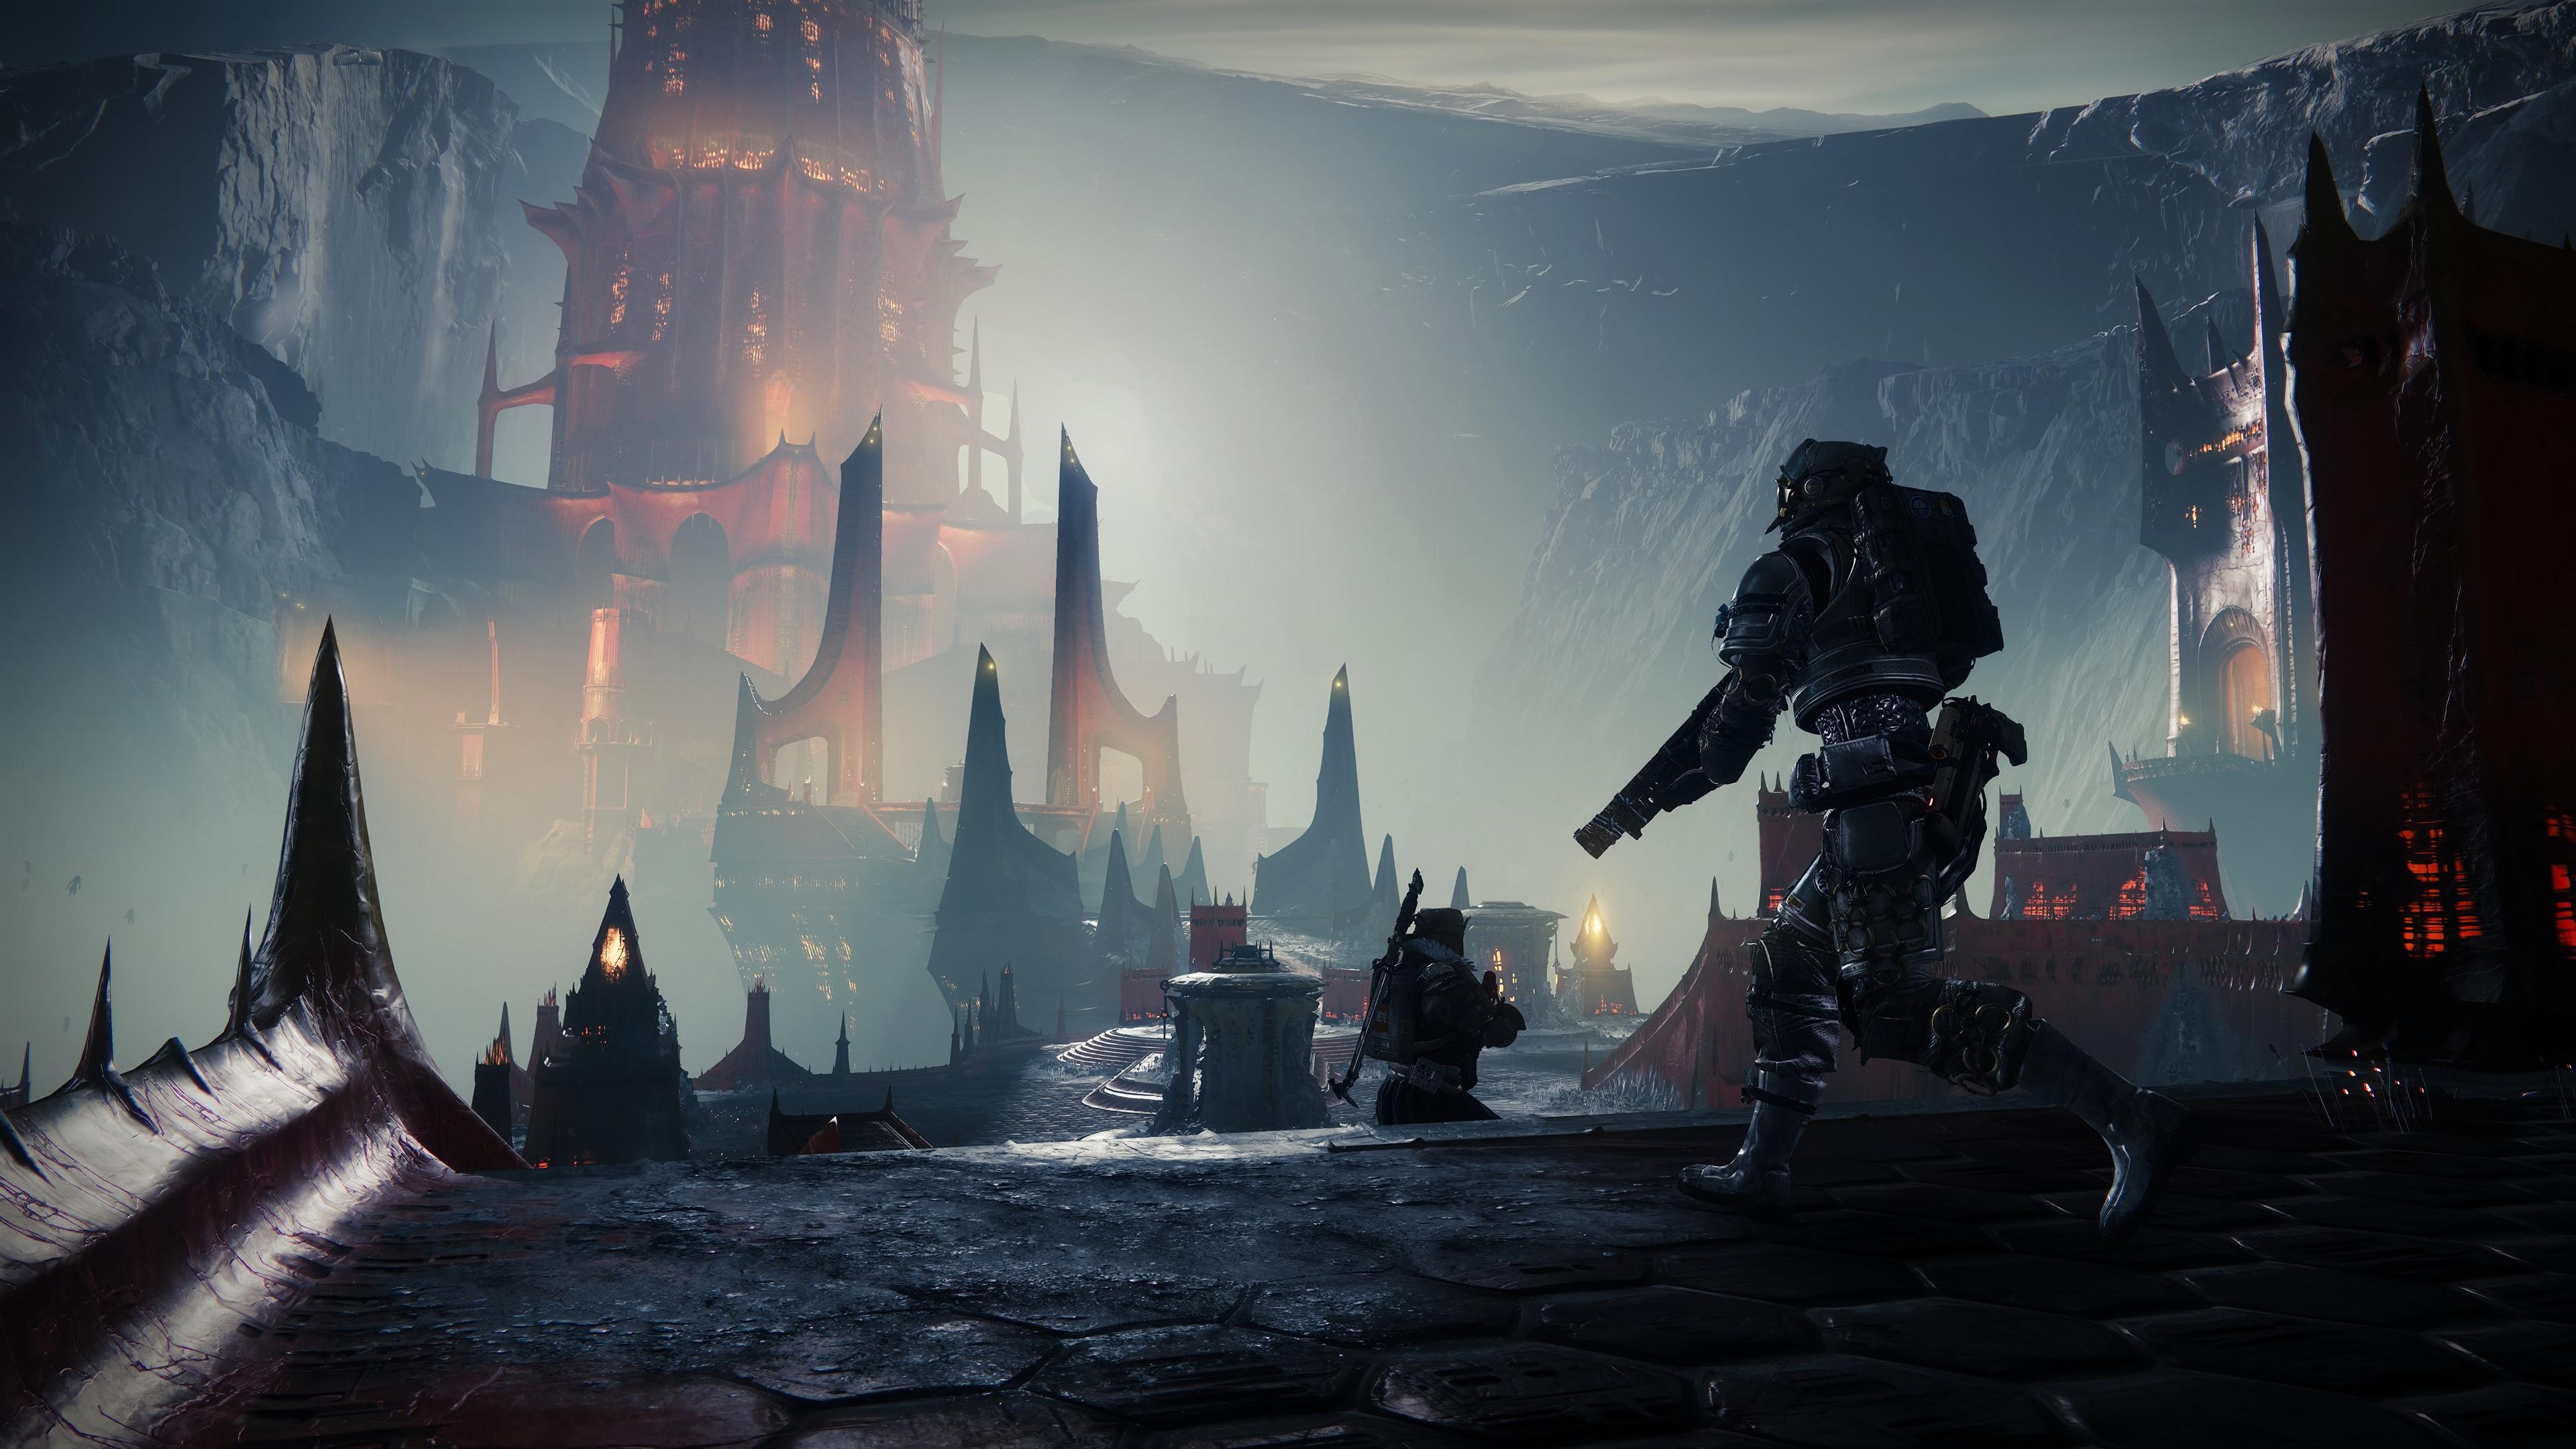 Wallpaper 4k Destiny 2 Shadow Keep 2019 Games Wallpapers 4k